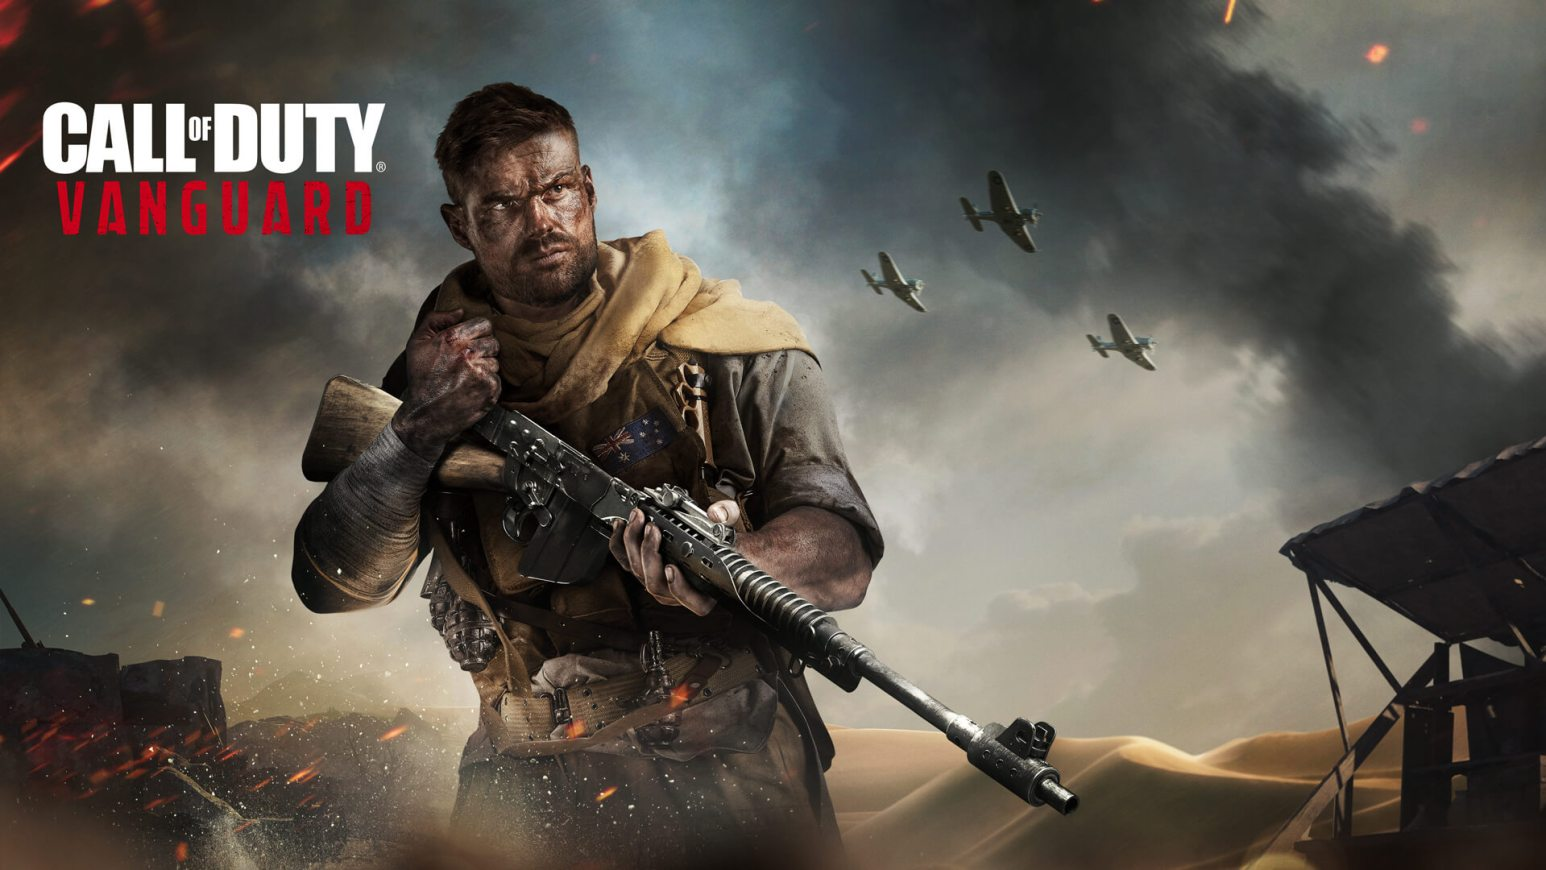 campaña de Call of Duty: Vanguard